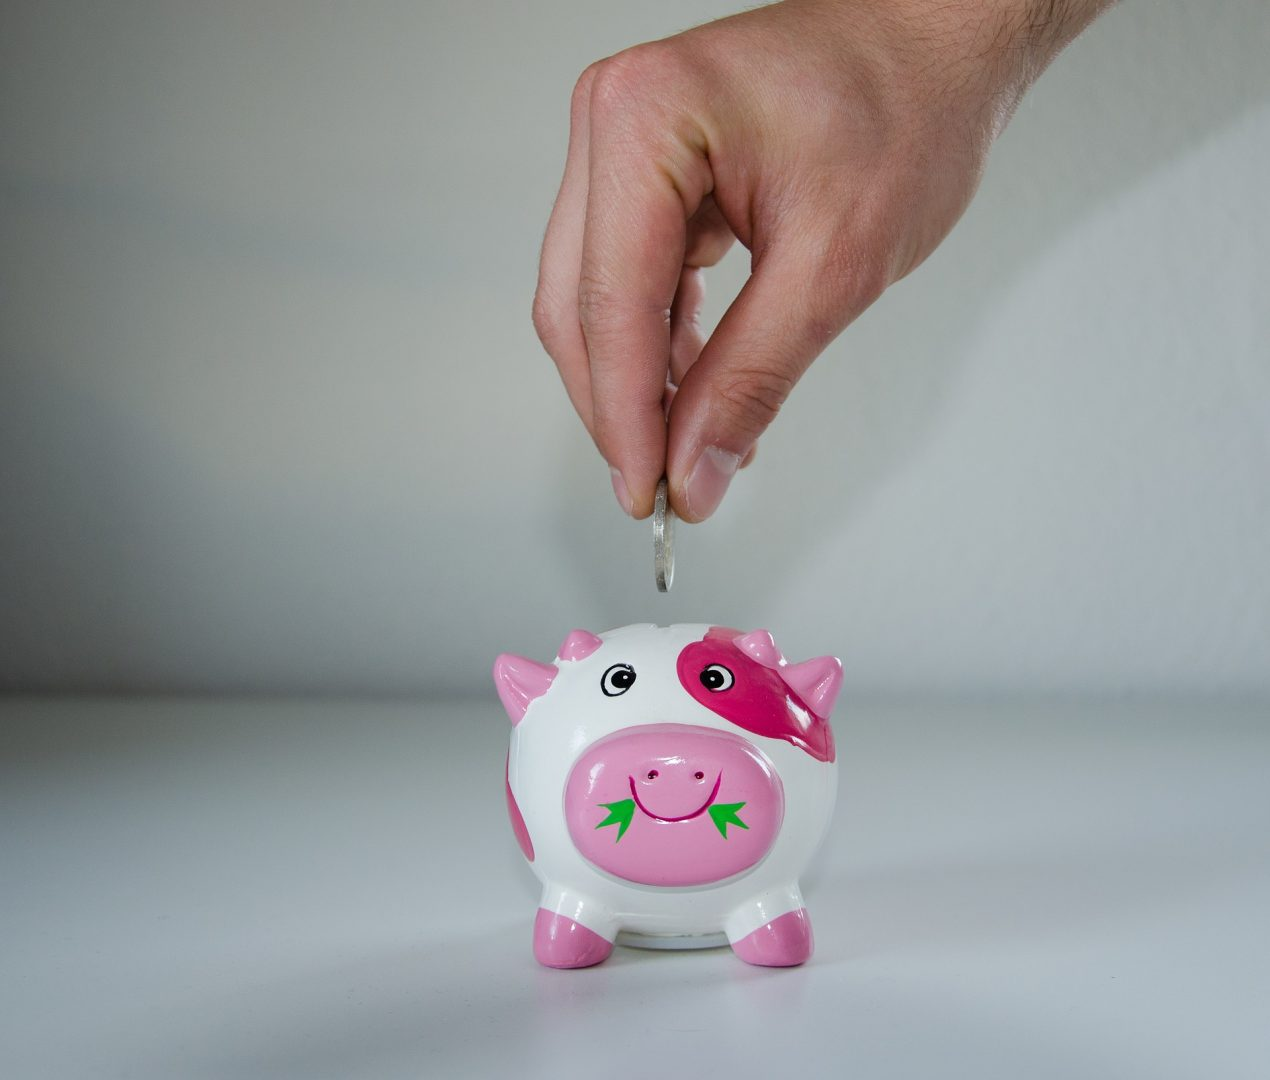 Mutui: tasso fisso o tasso variabile?